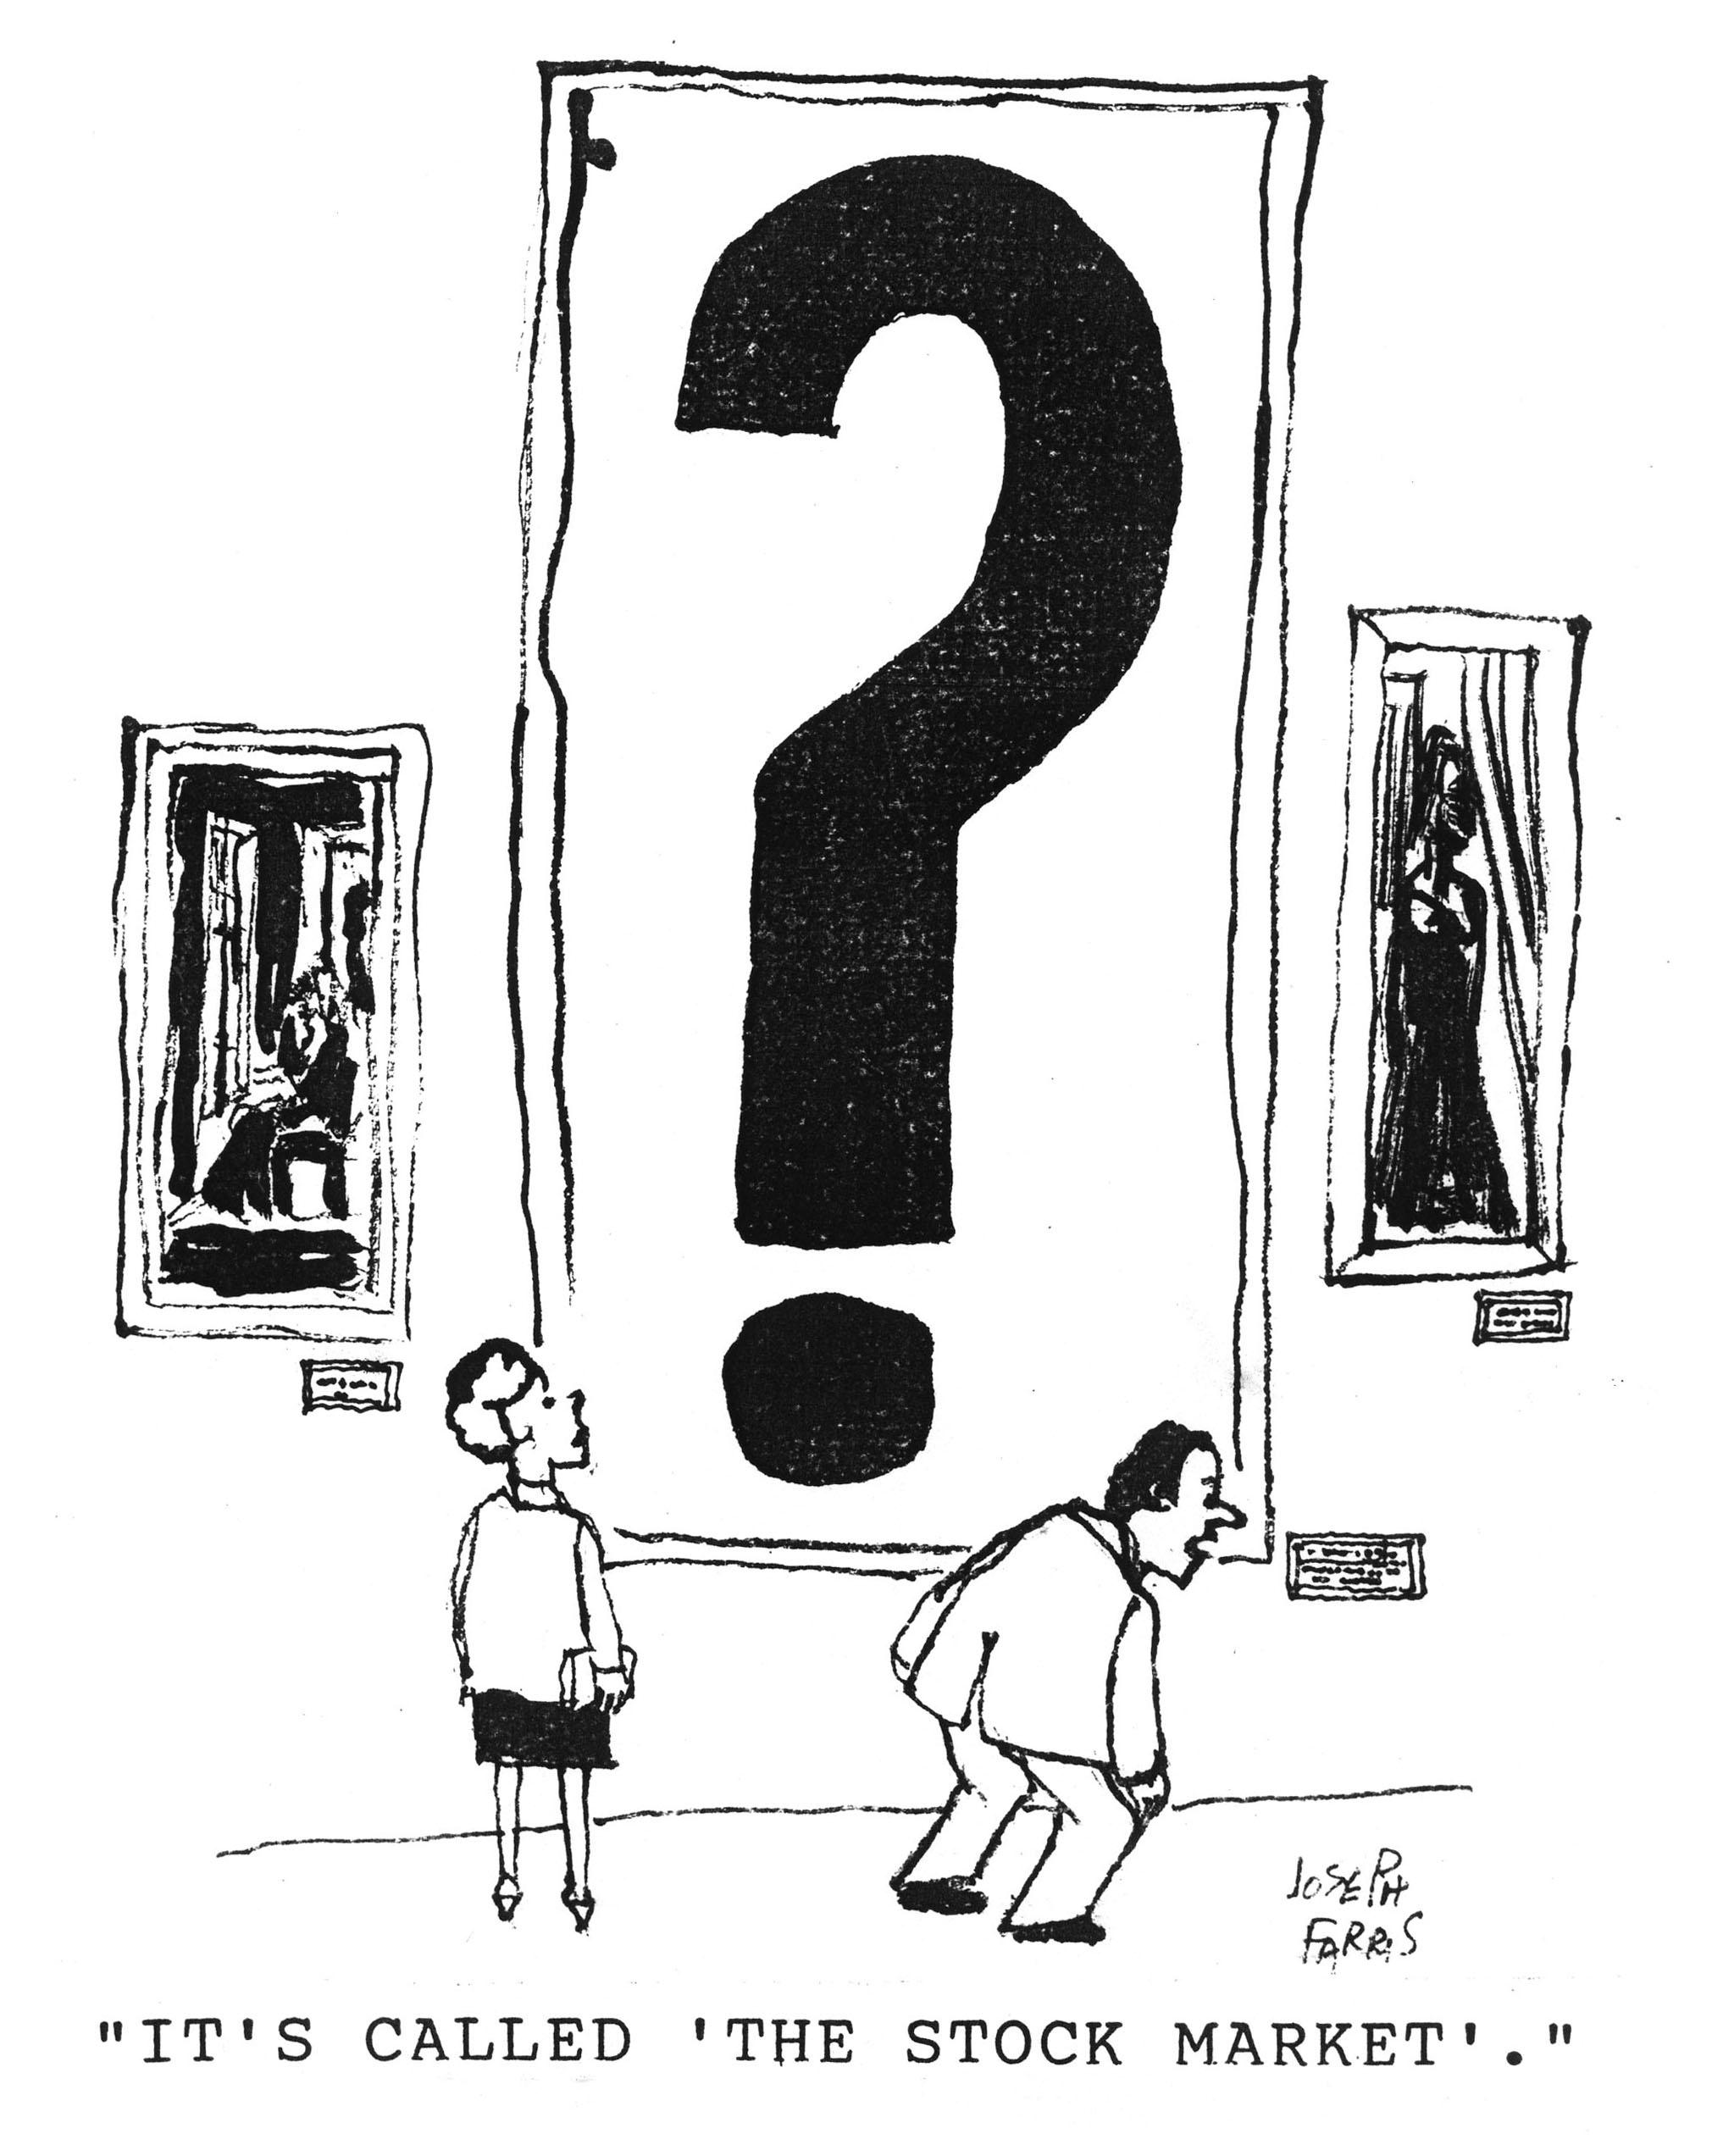 Cartoonist: Farris, Joseph; cartoonstock.com – Saturday, 25 March 2017